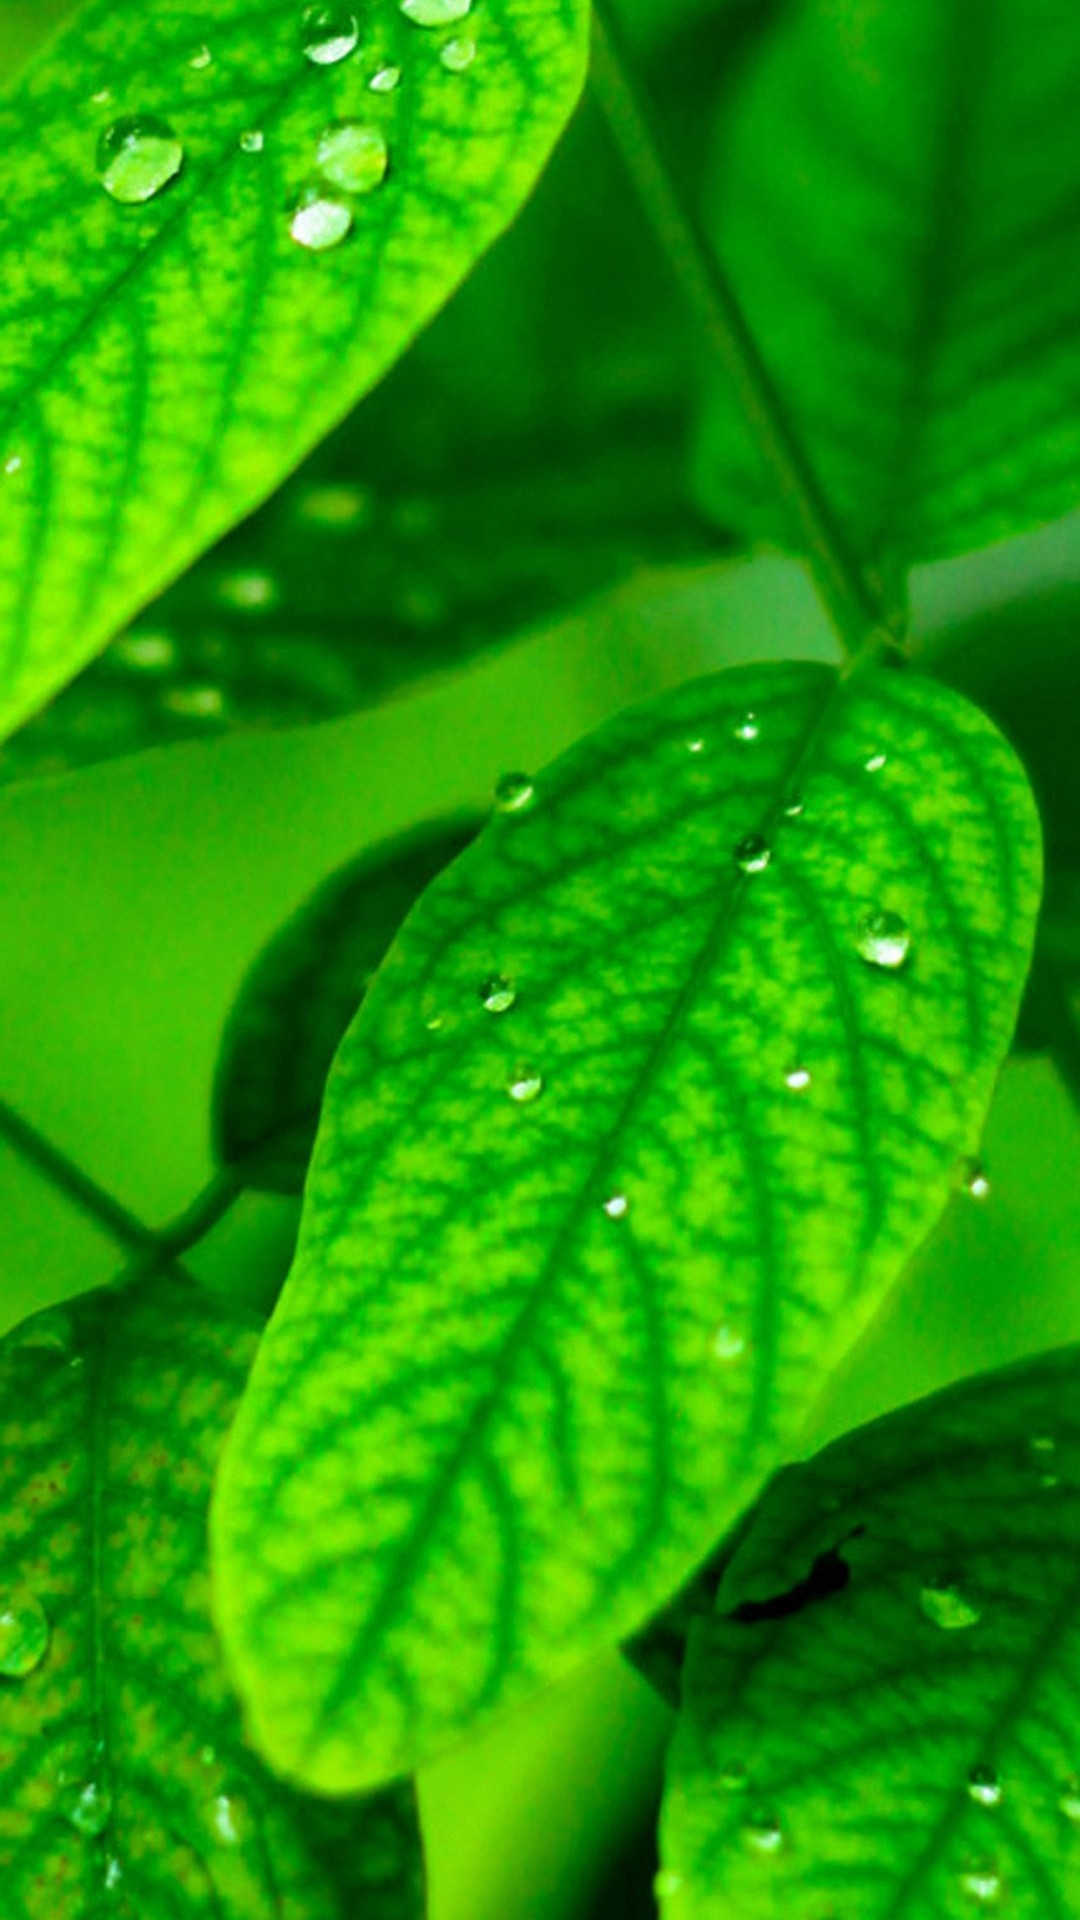 Green Leaf Wallpaper Hd 70 Images